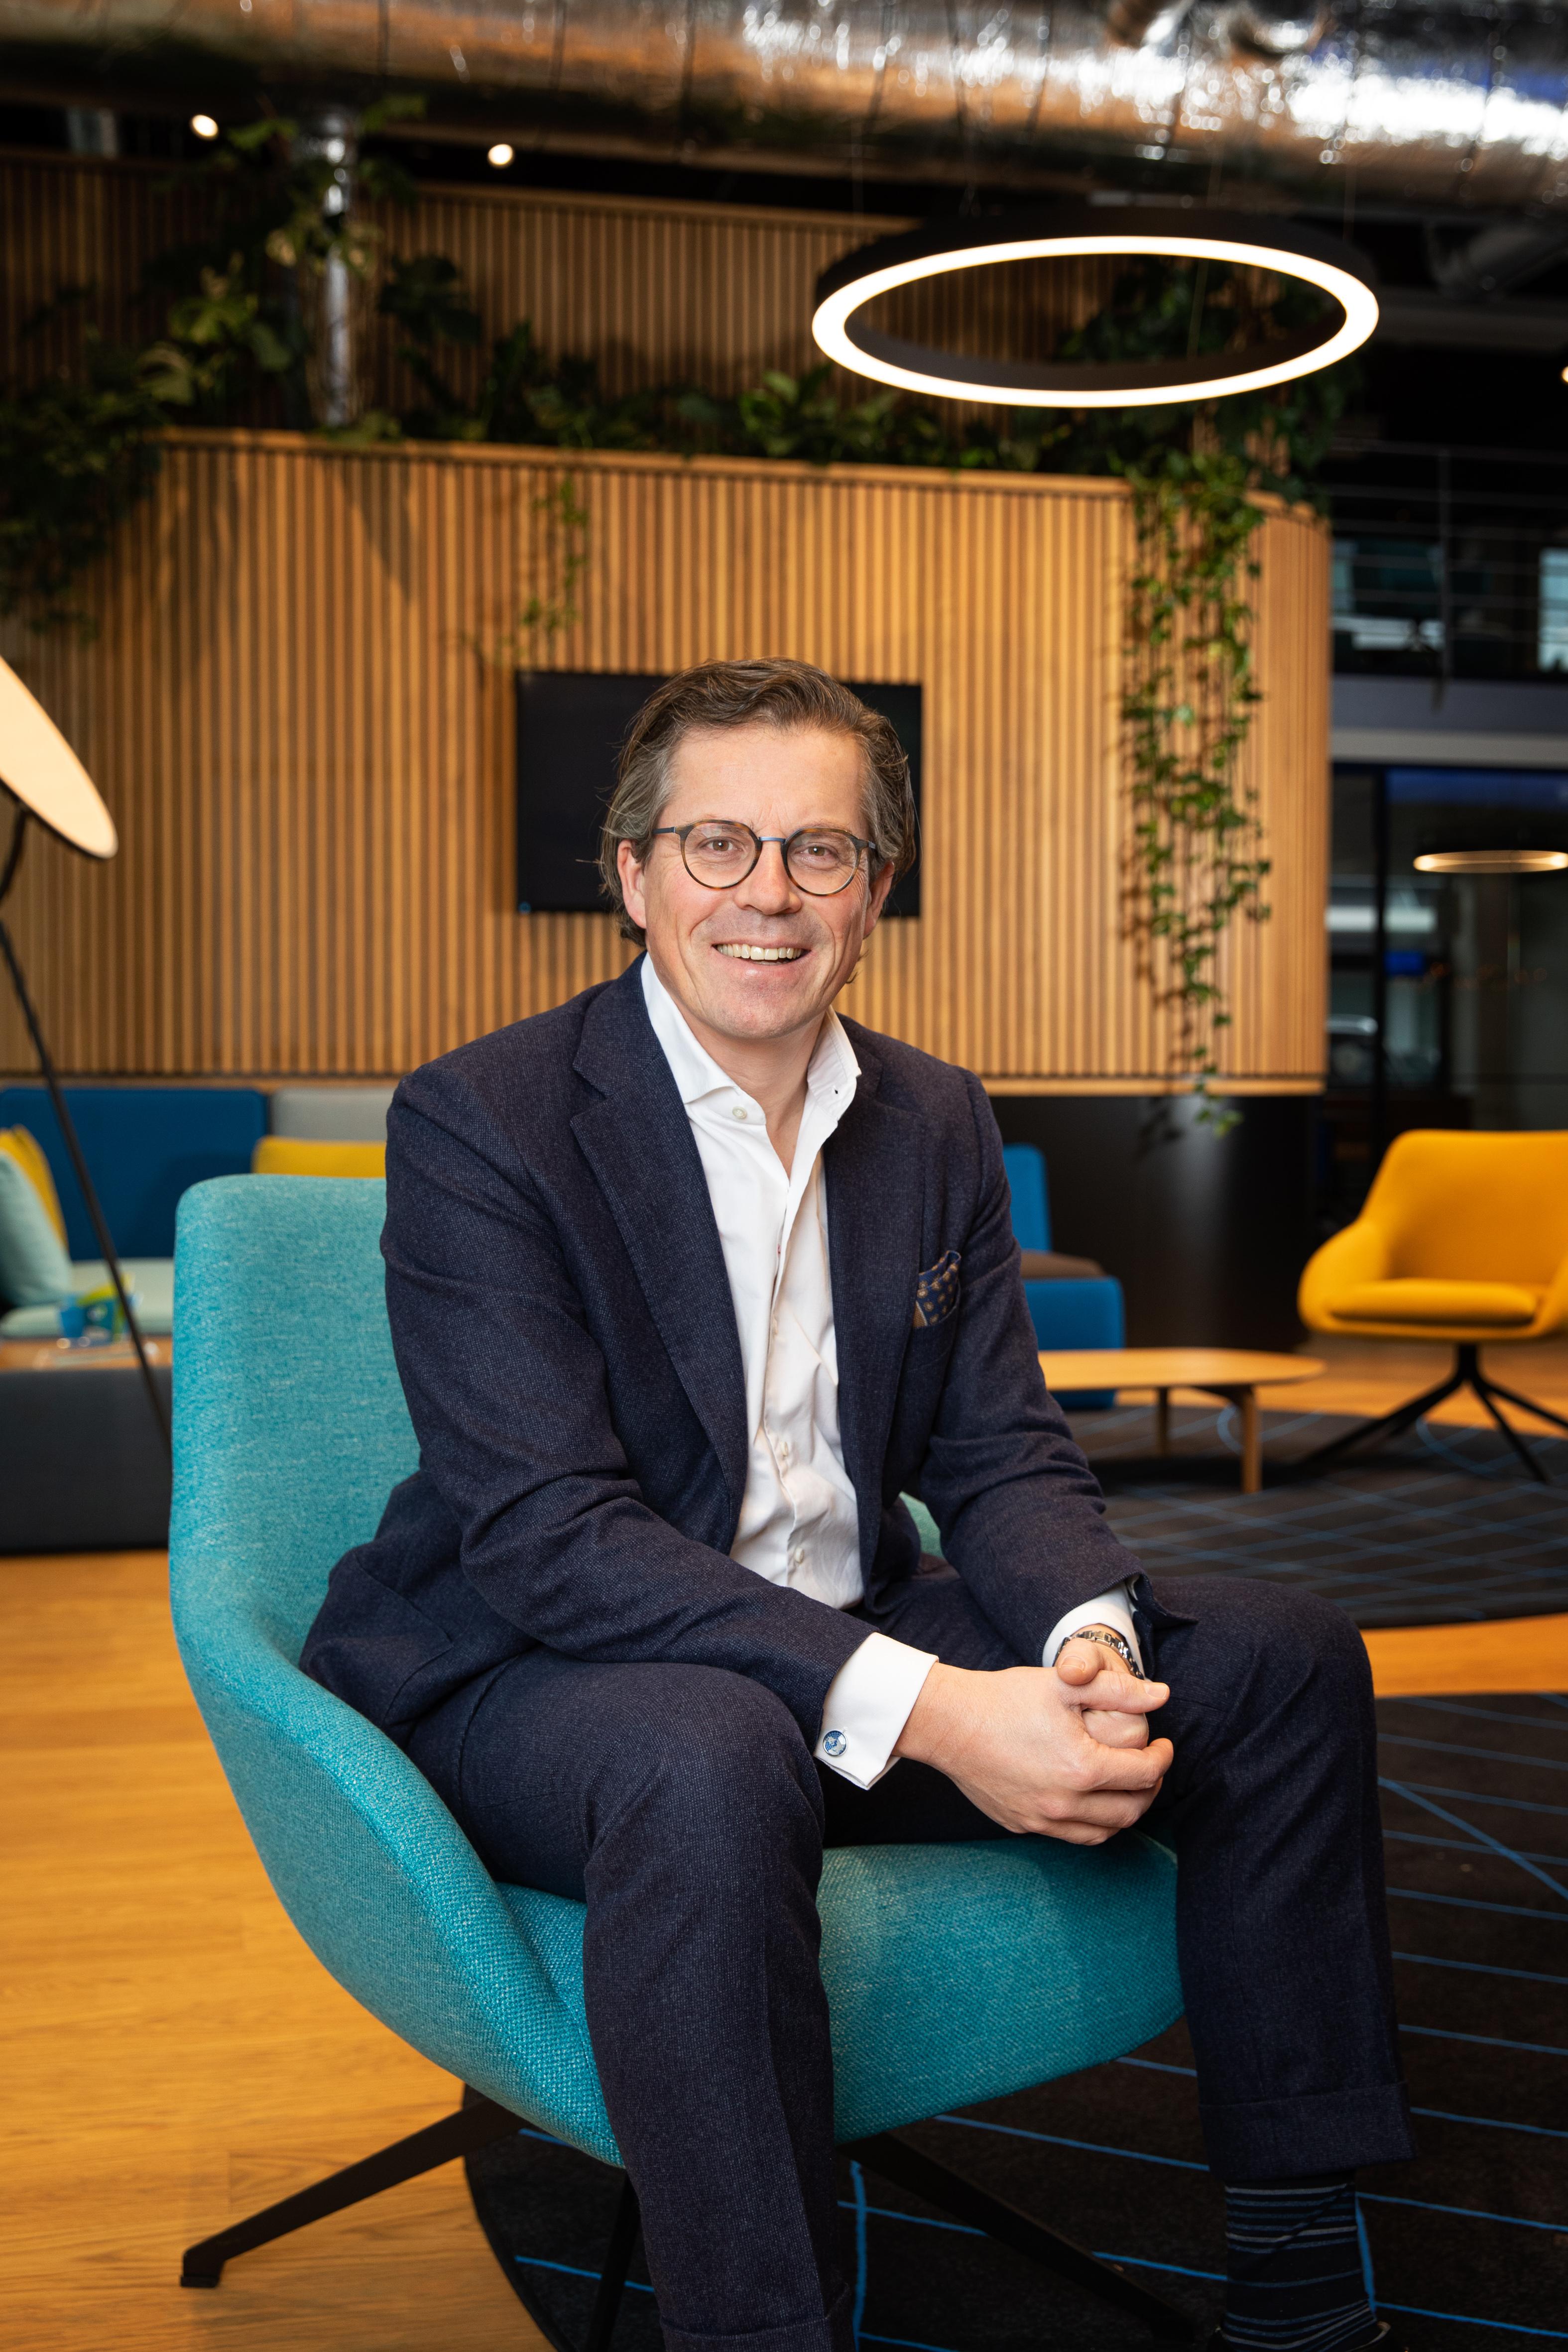 Kristof Vereenooghe, CEO of EVBox Group